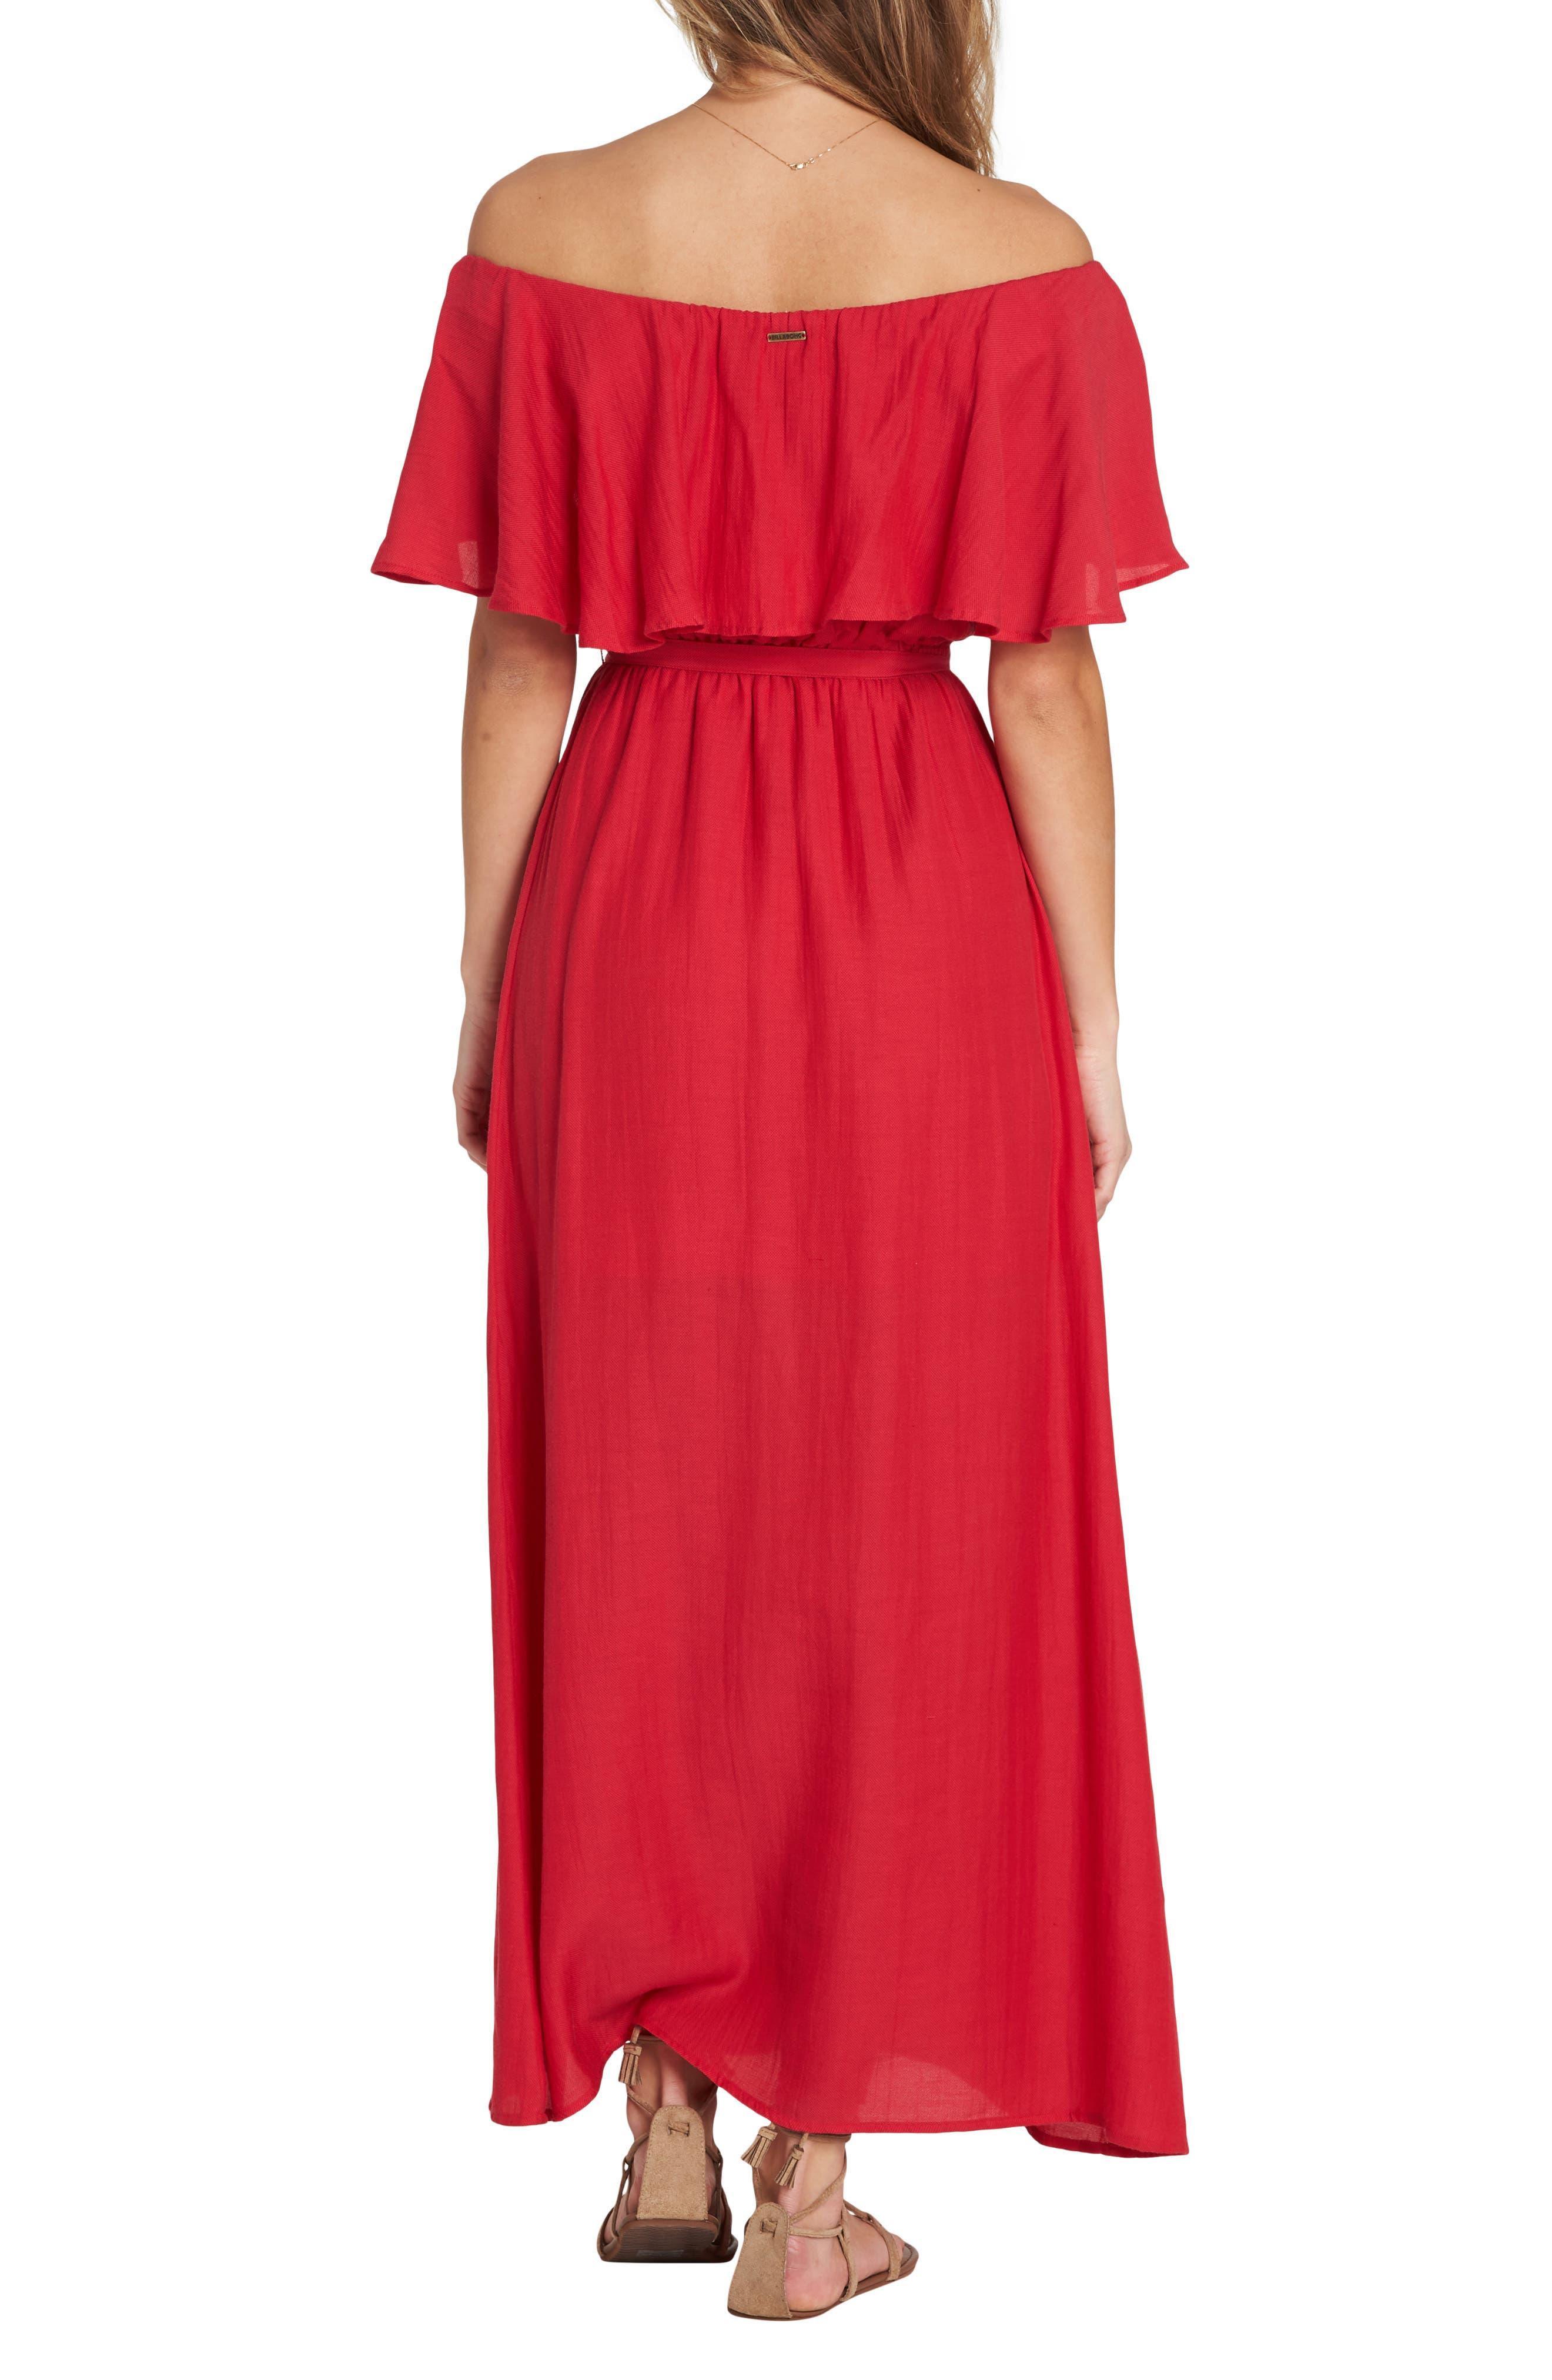 Dance All Night Maxi Dress,                             Alternate thumbnail 2, color,                             GARNET